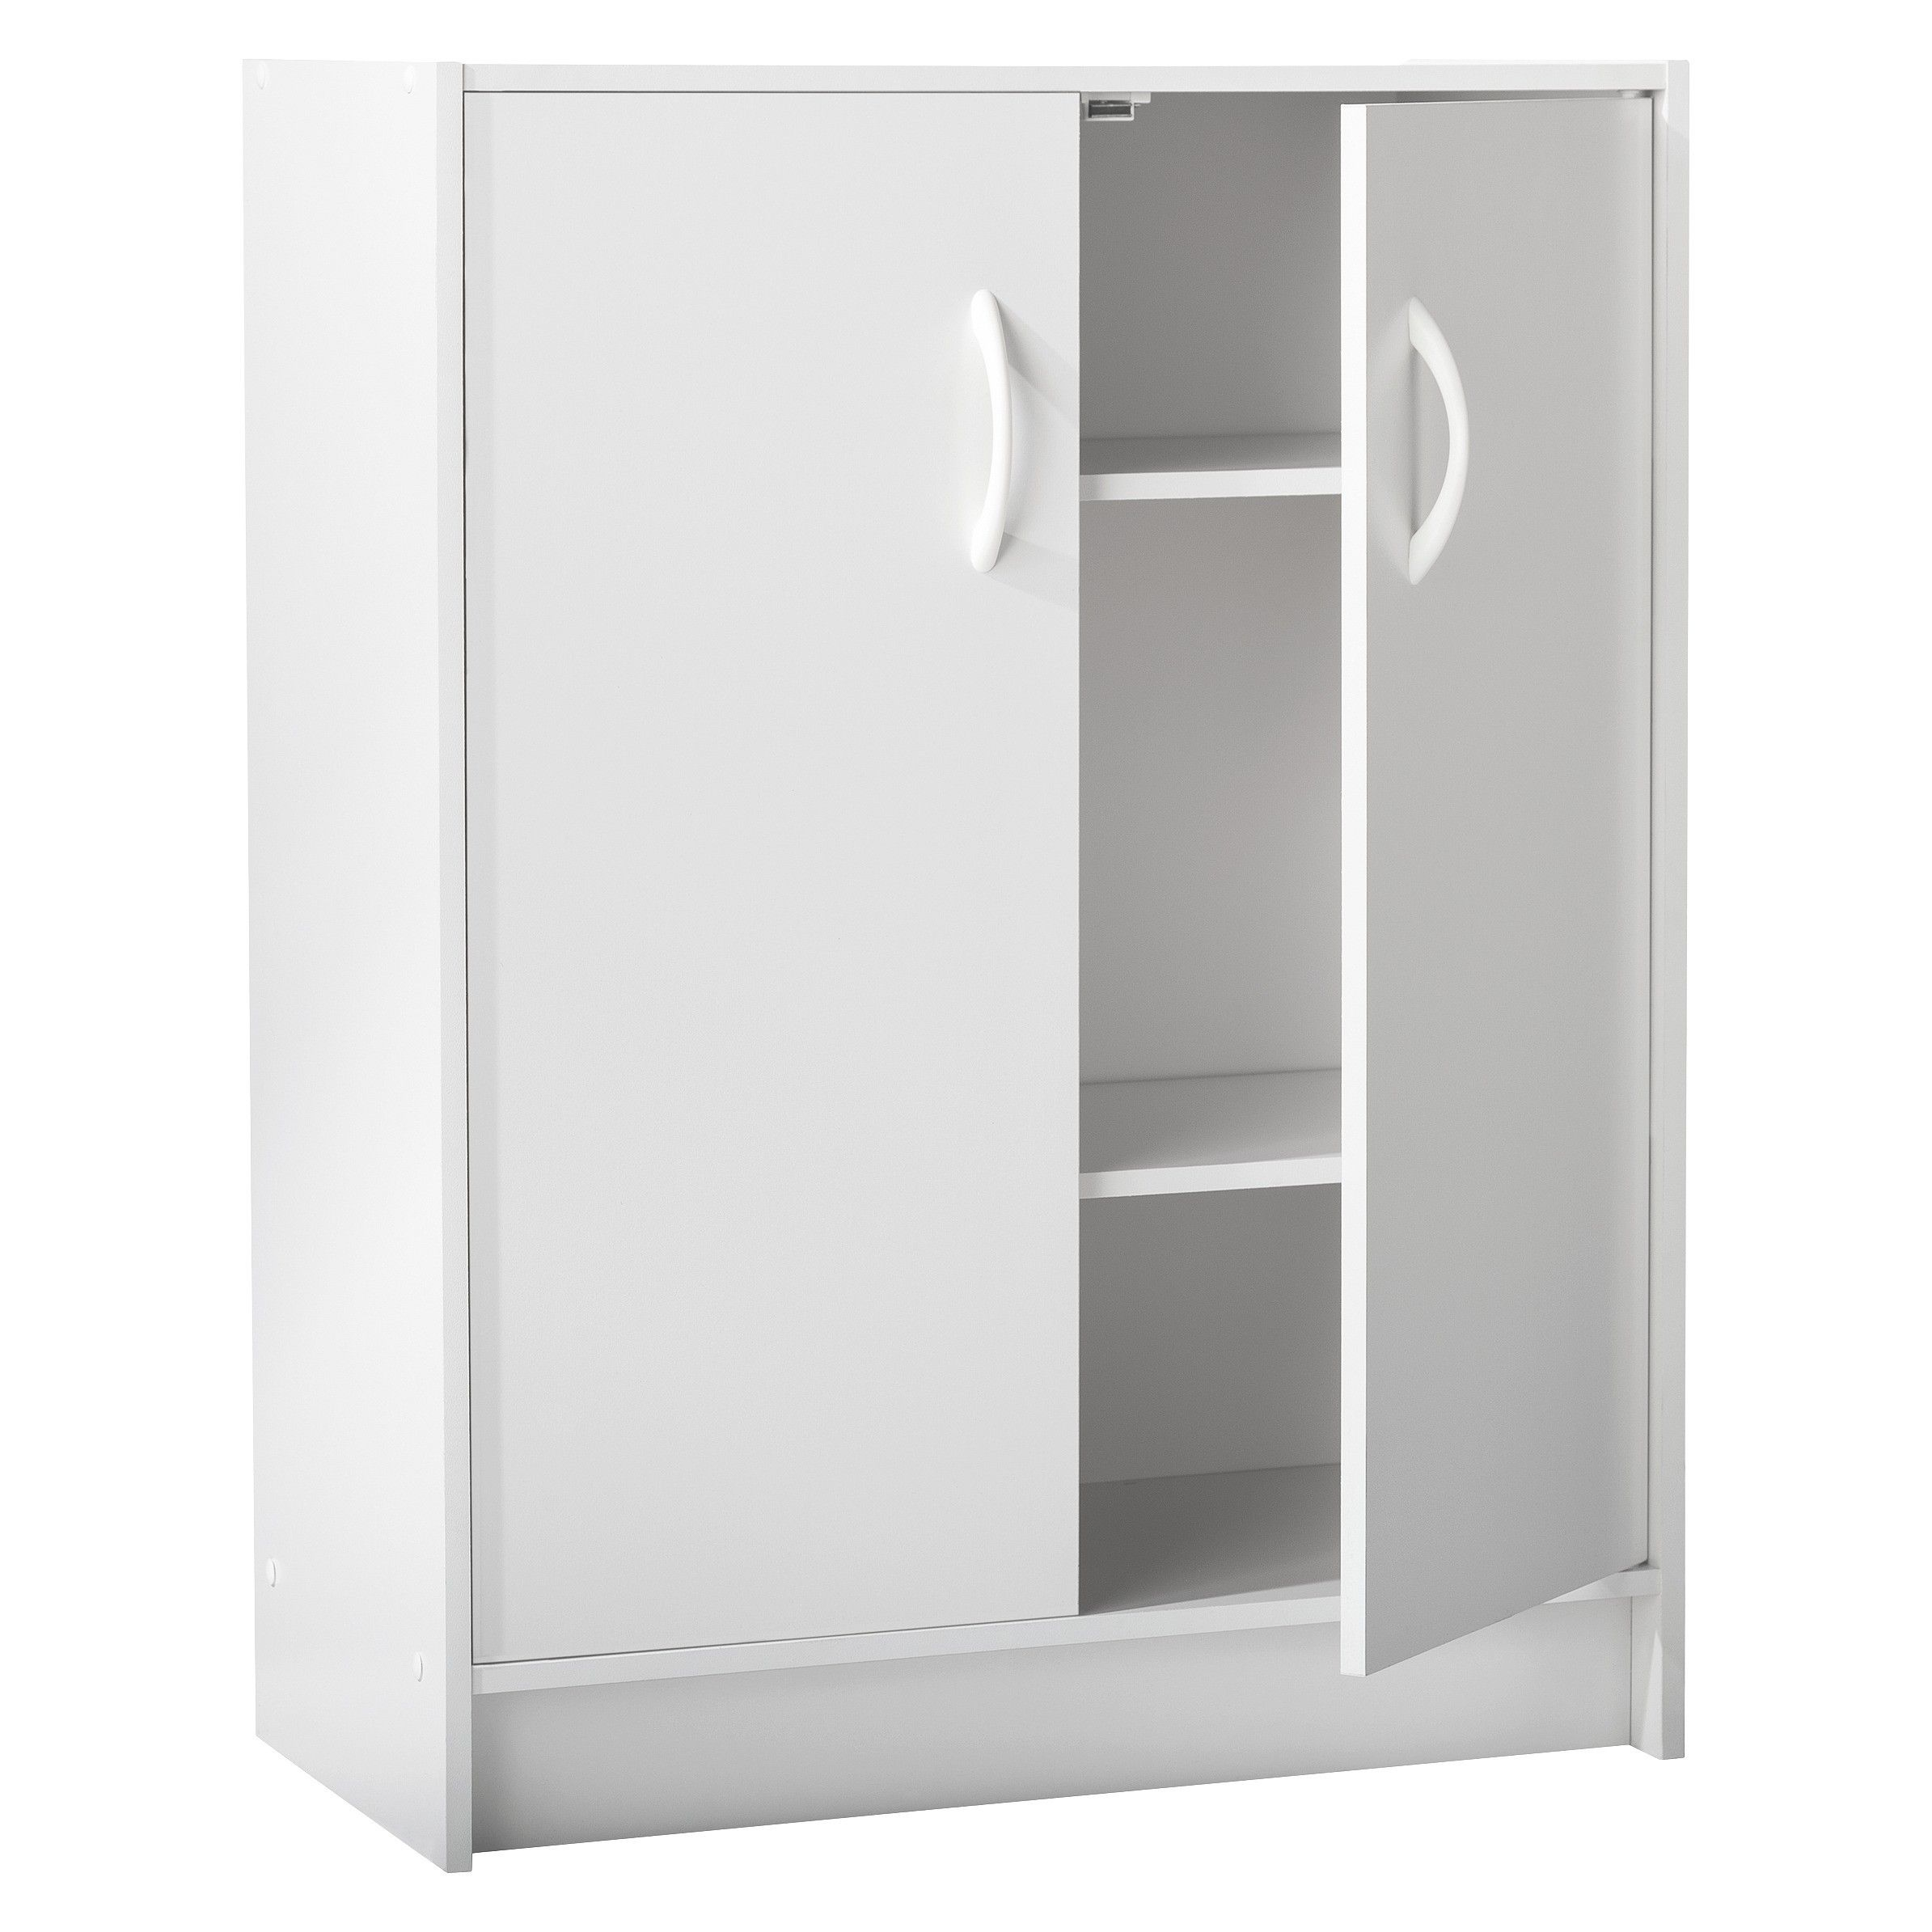 Room Essentials 2 Door Organizer White Target Room Essentials Door Organizer Tall Cabinet Storage